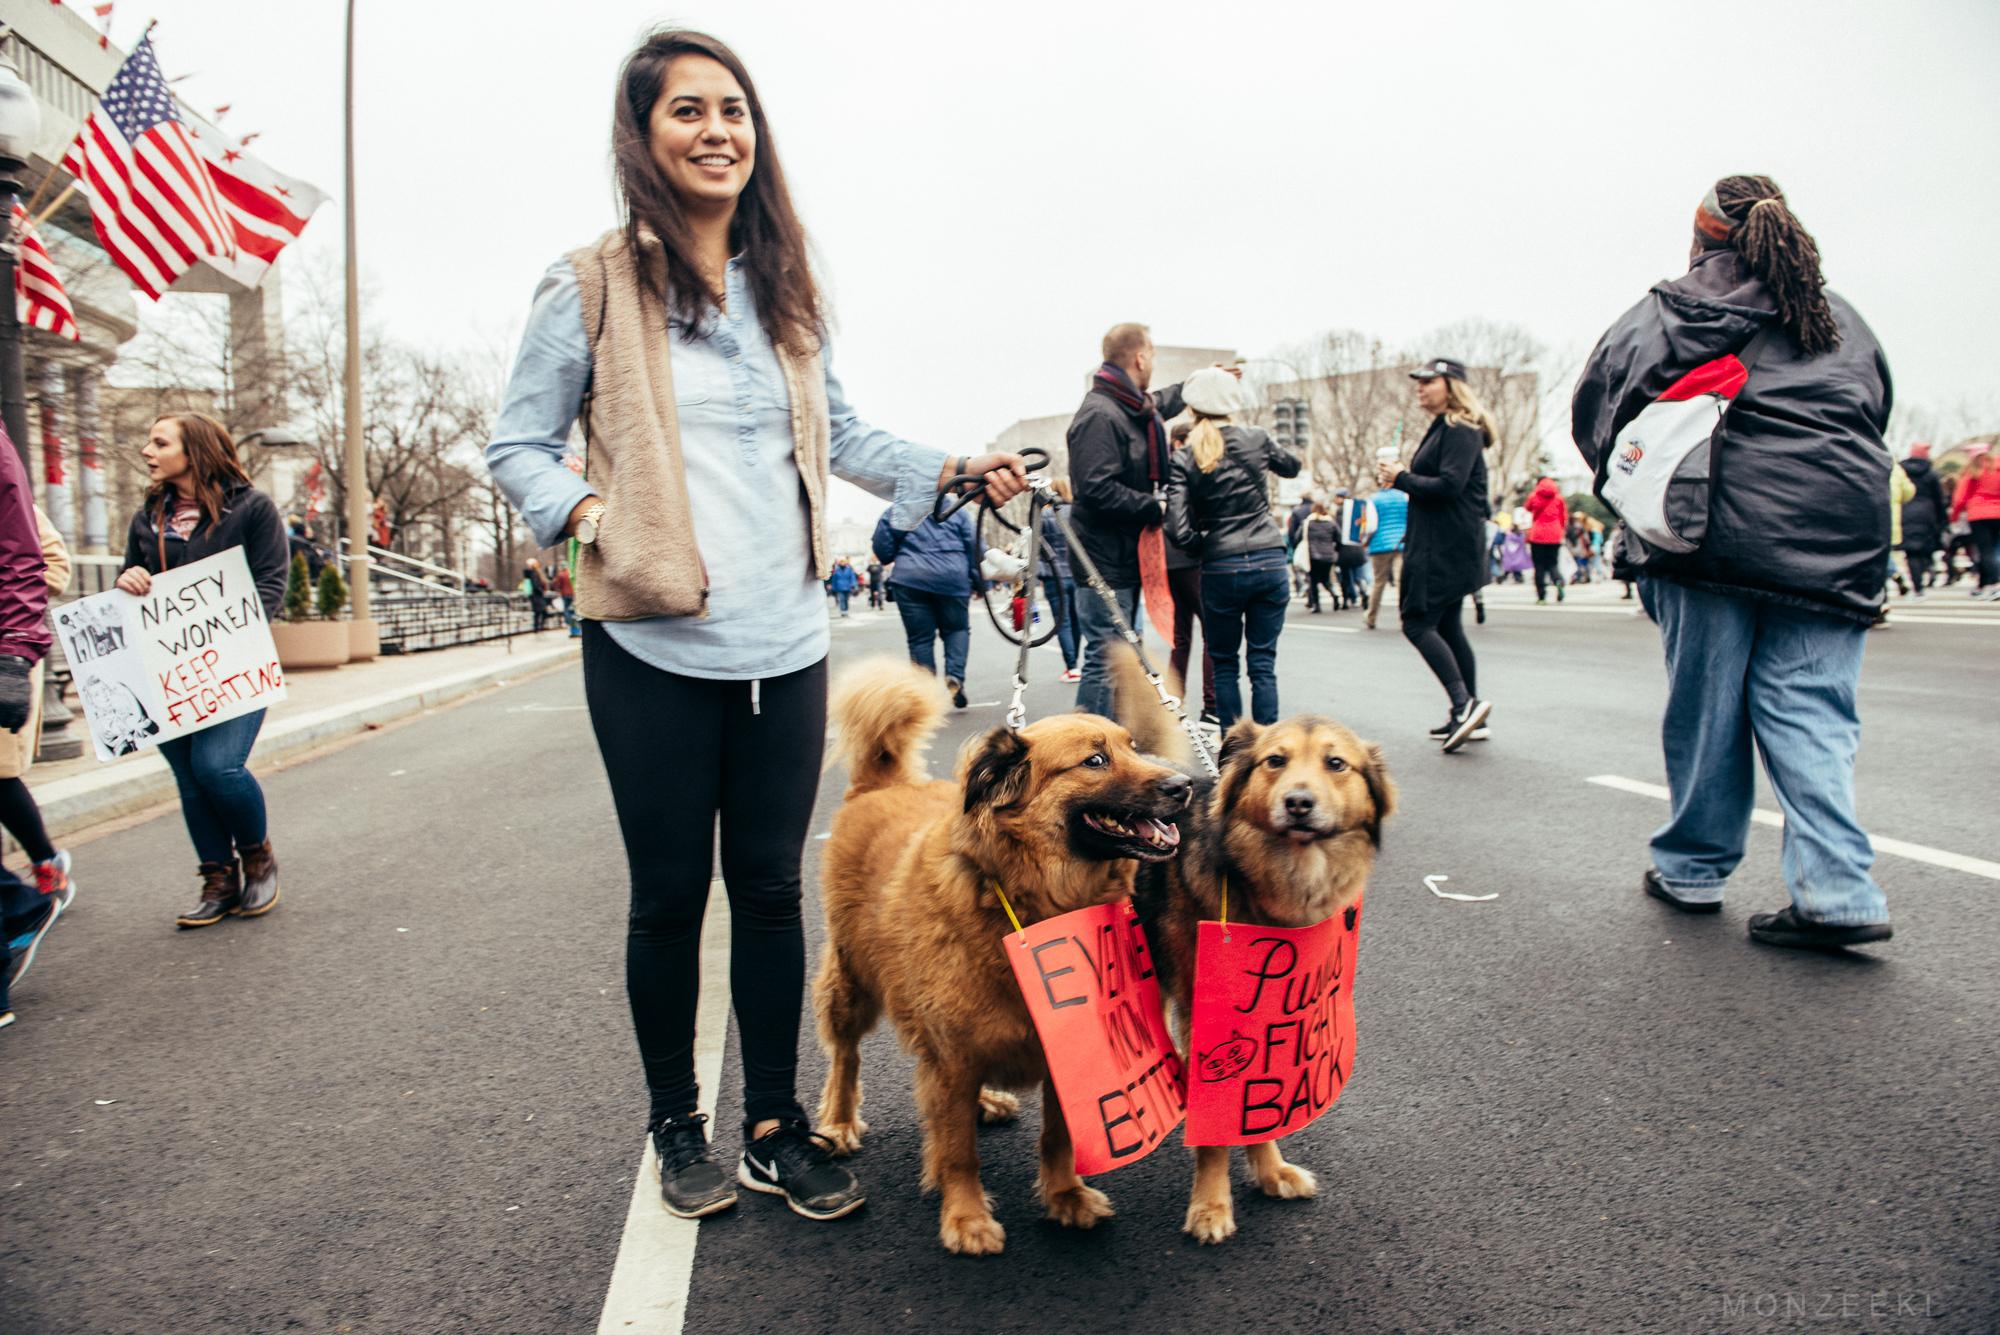 20170120-womens-march-dc-2301.jpg